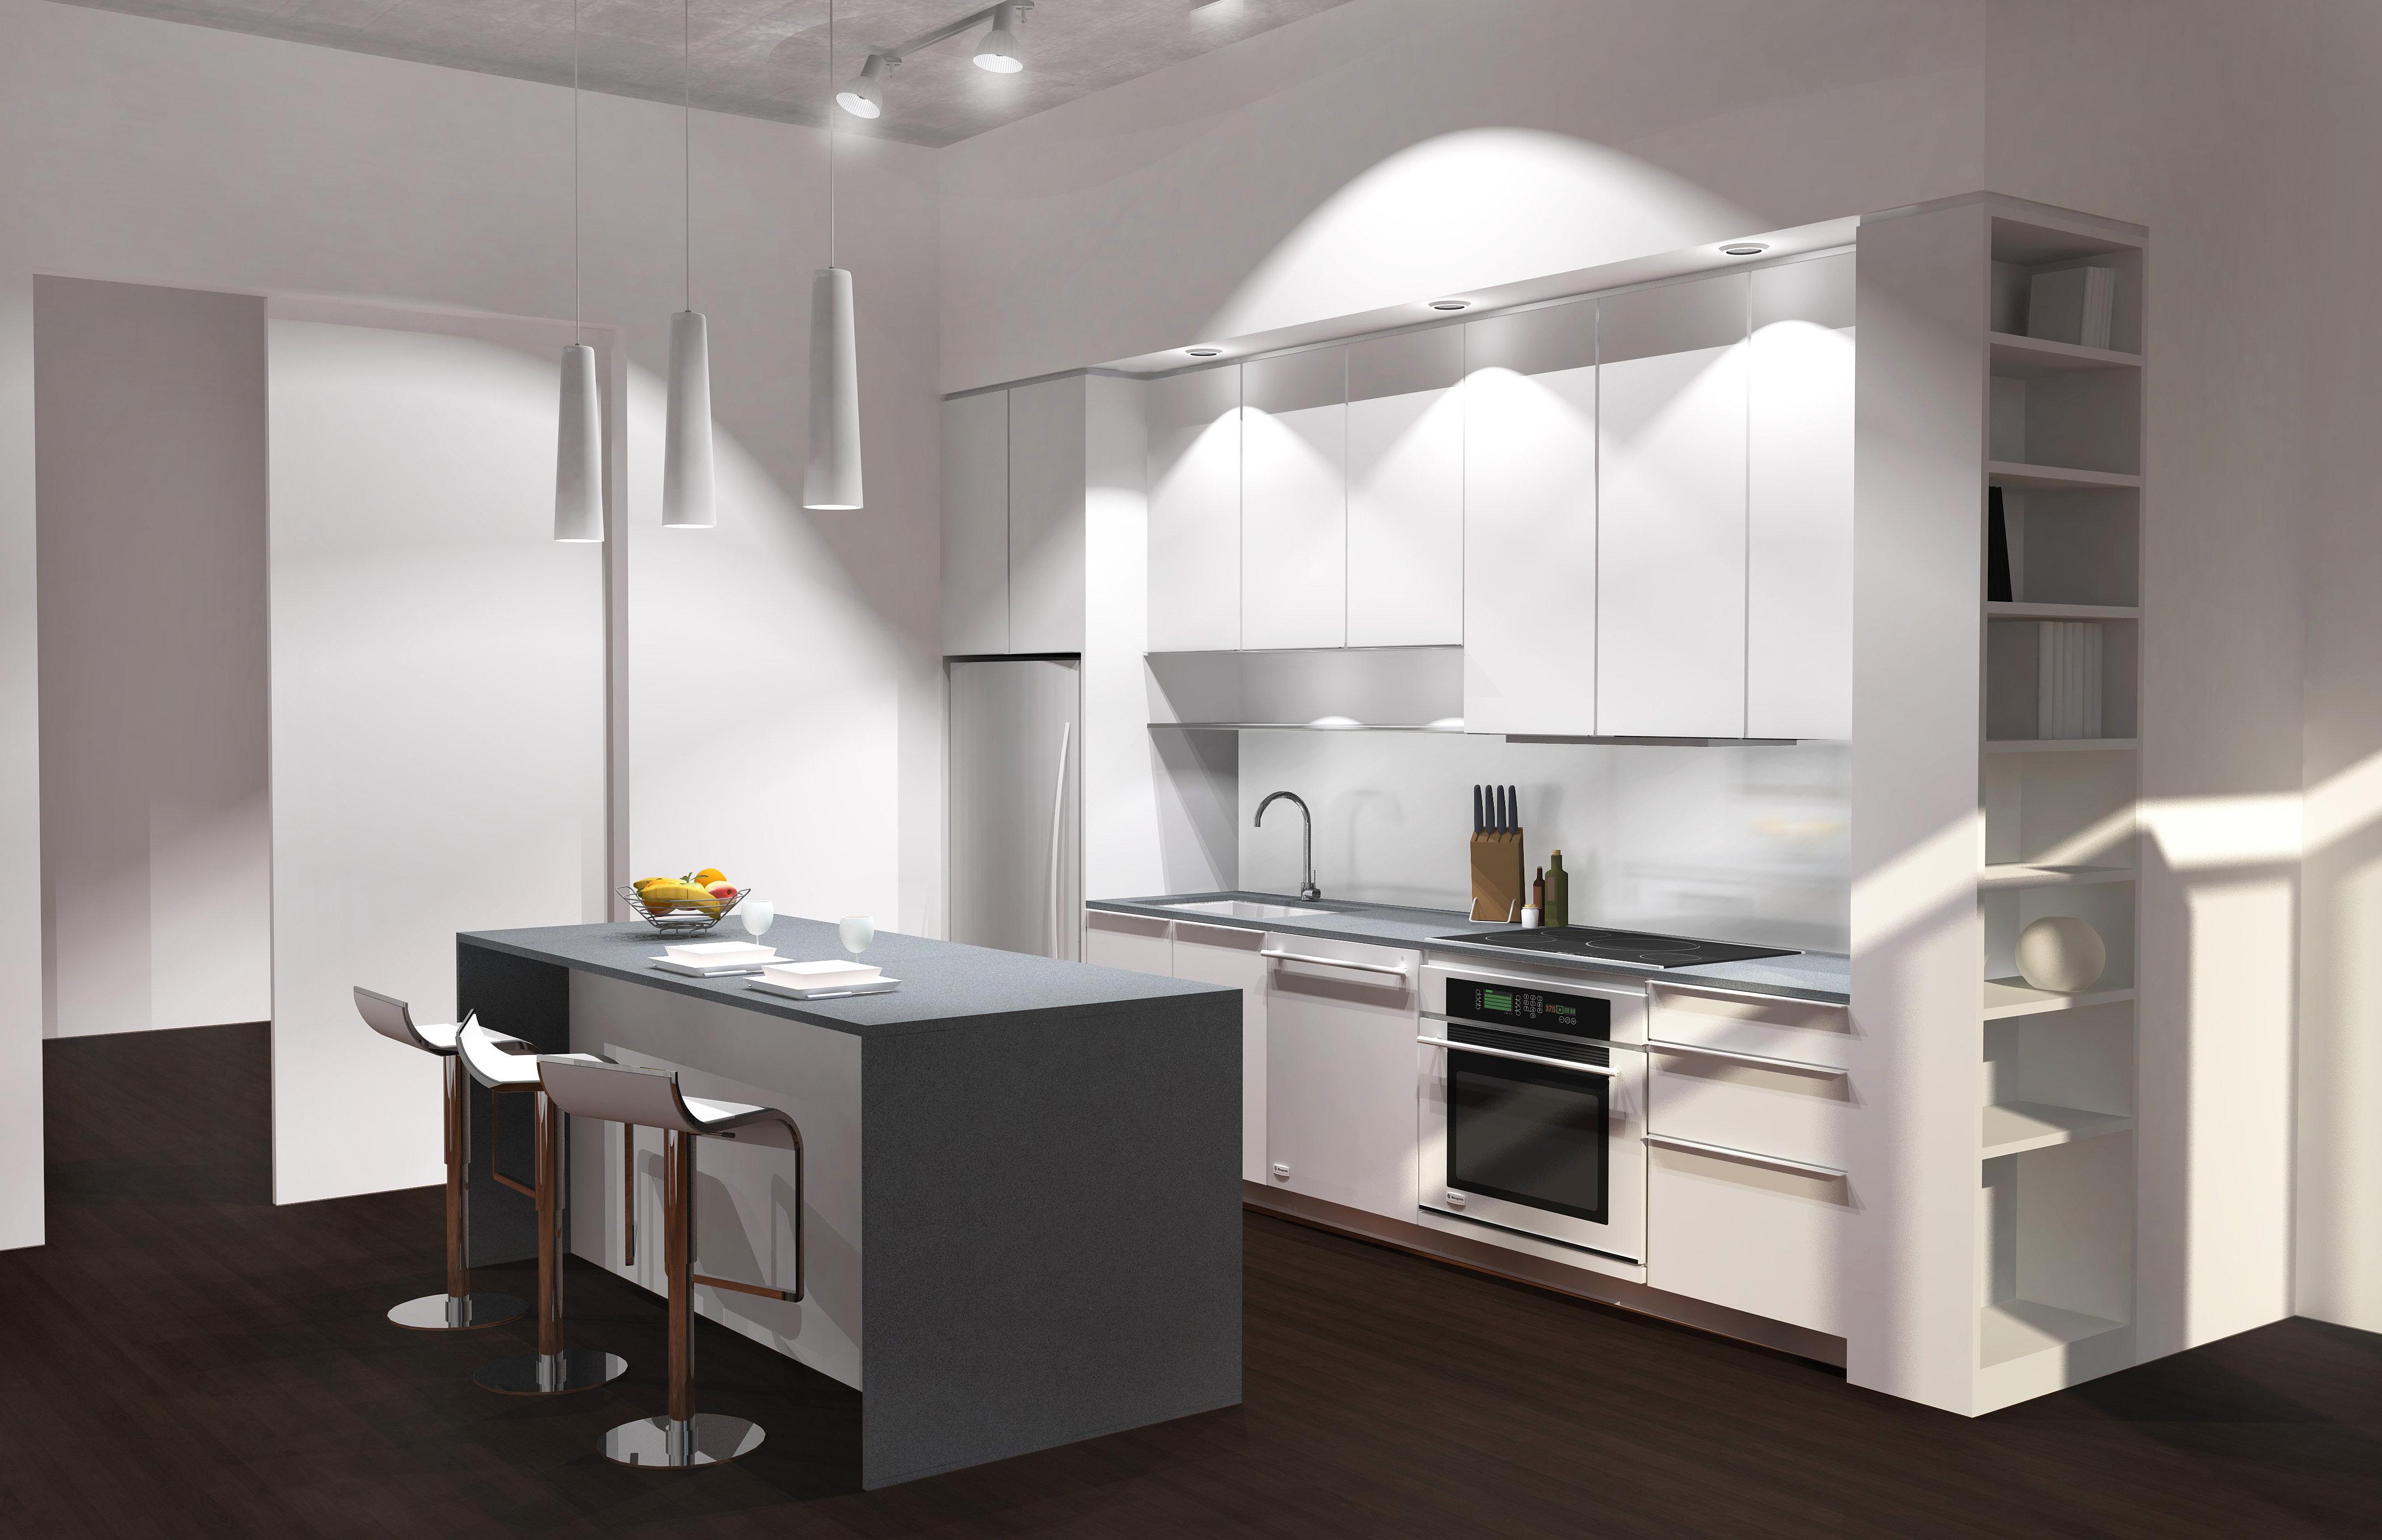 decoration cuisine grise et blanche. Black Bedroom Furniture Sets. Home Design Ideas